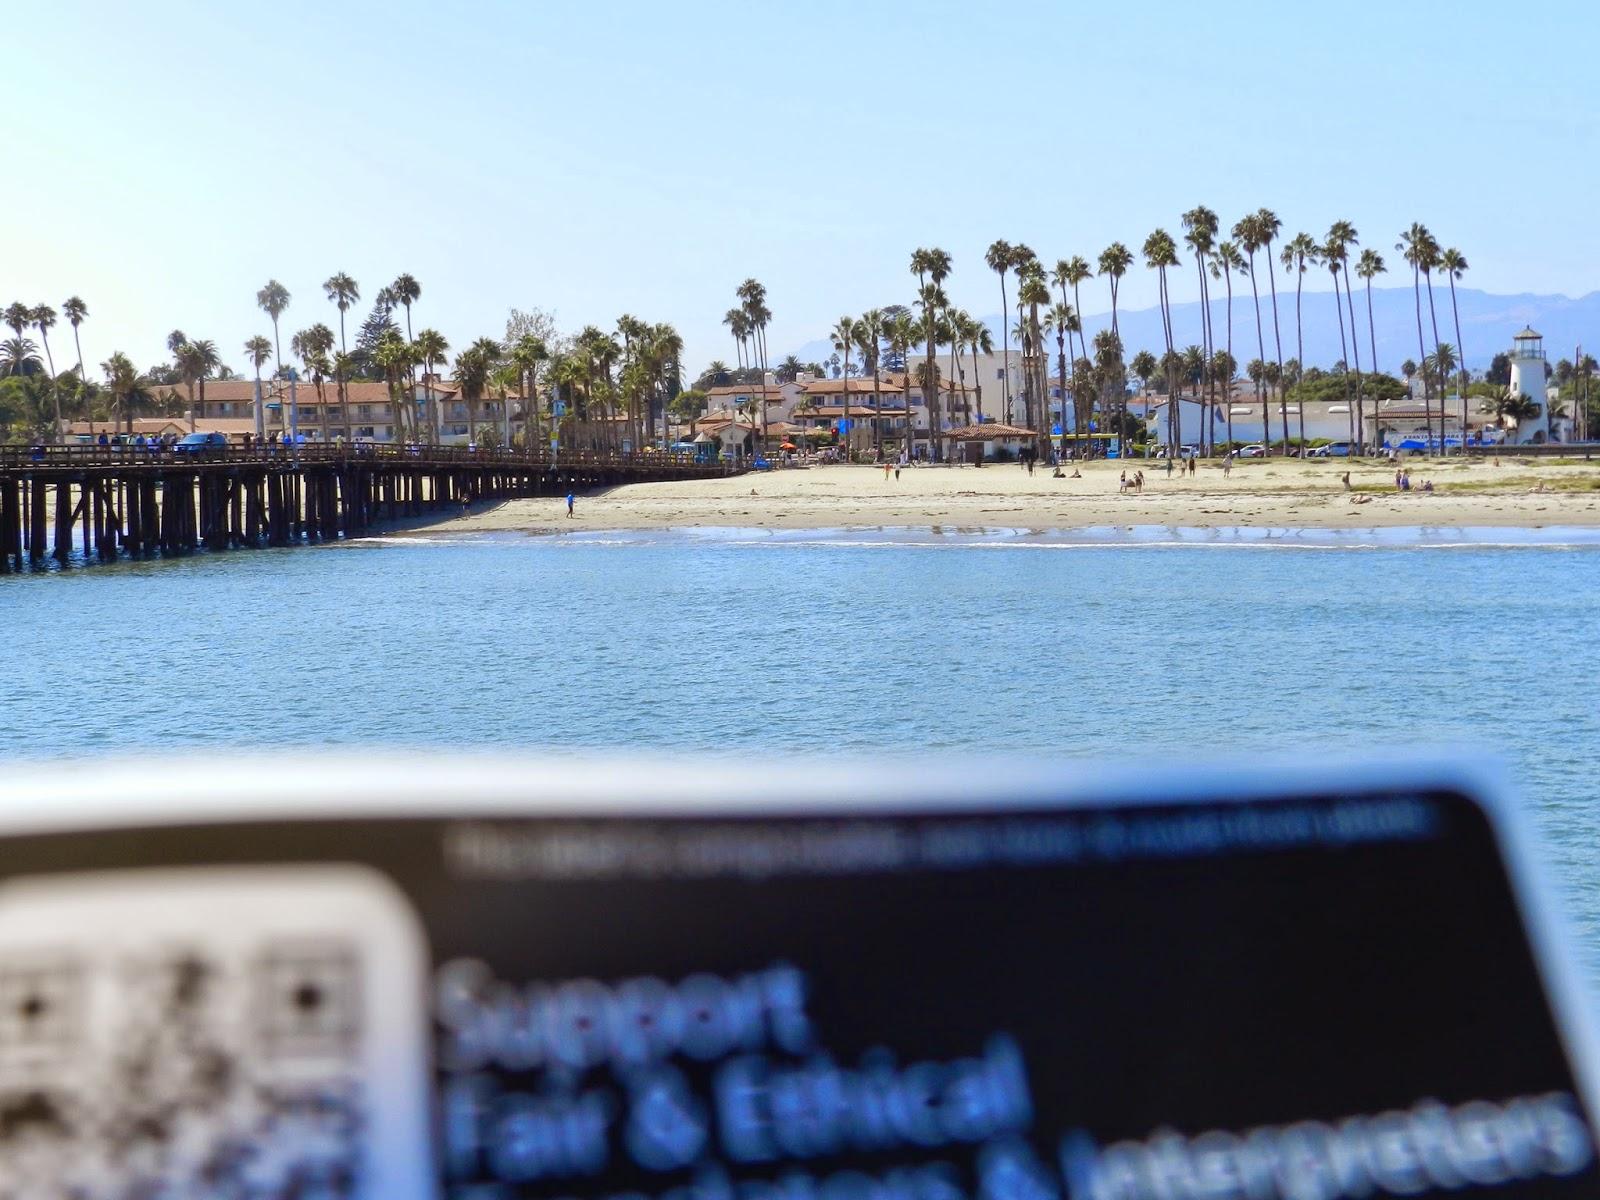 Santa Barbara supports fair and ethical freelance translators, interpreters and language companies